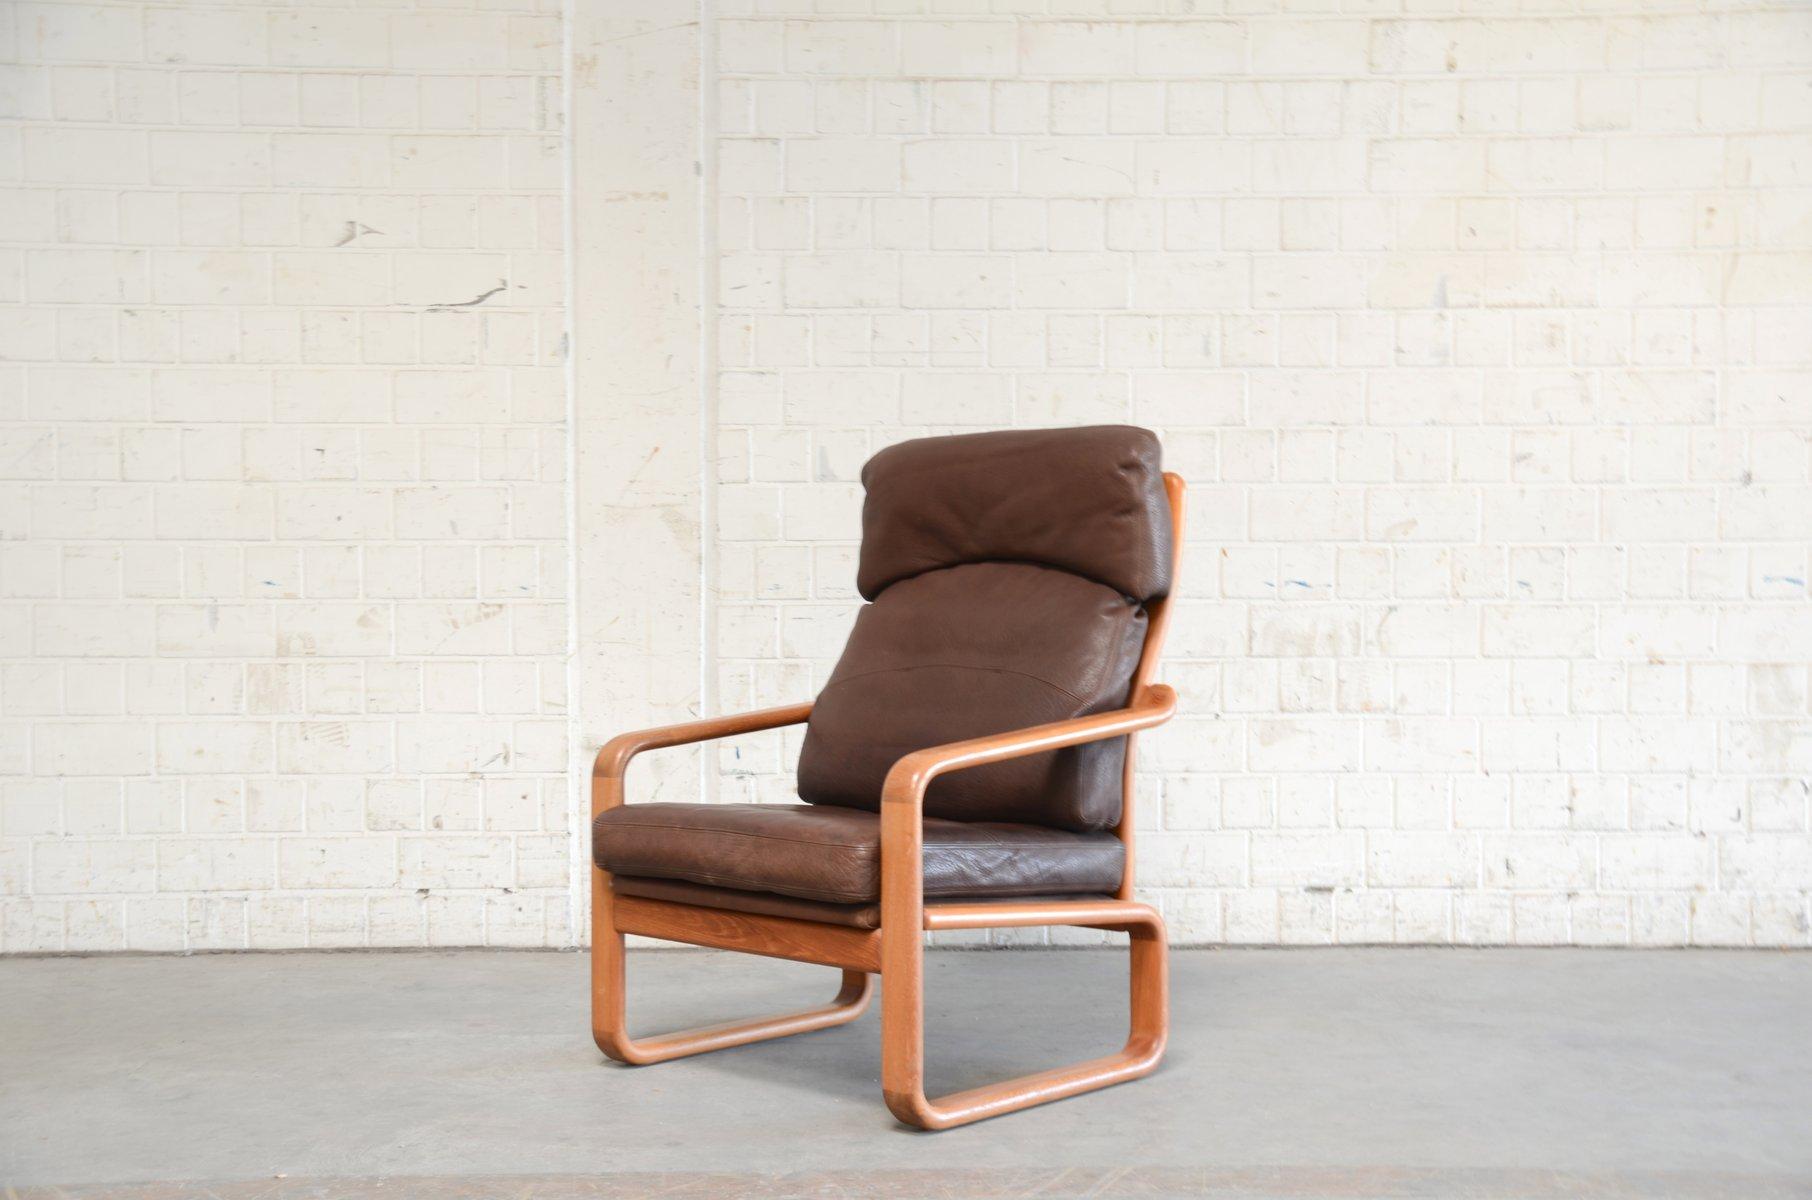 Vintage Sessel aus Teak & Leder von Holstebro